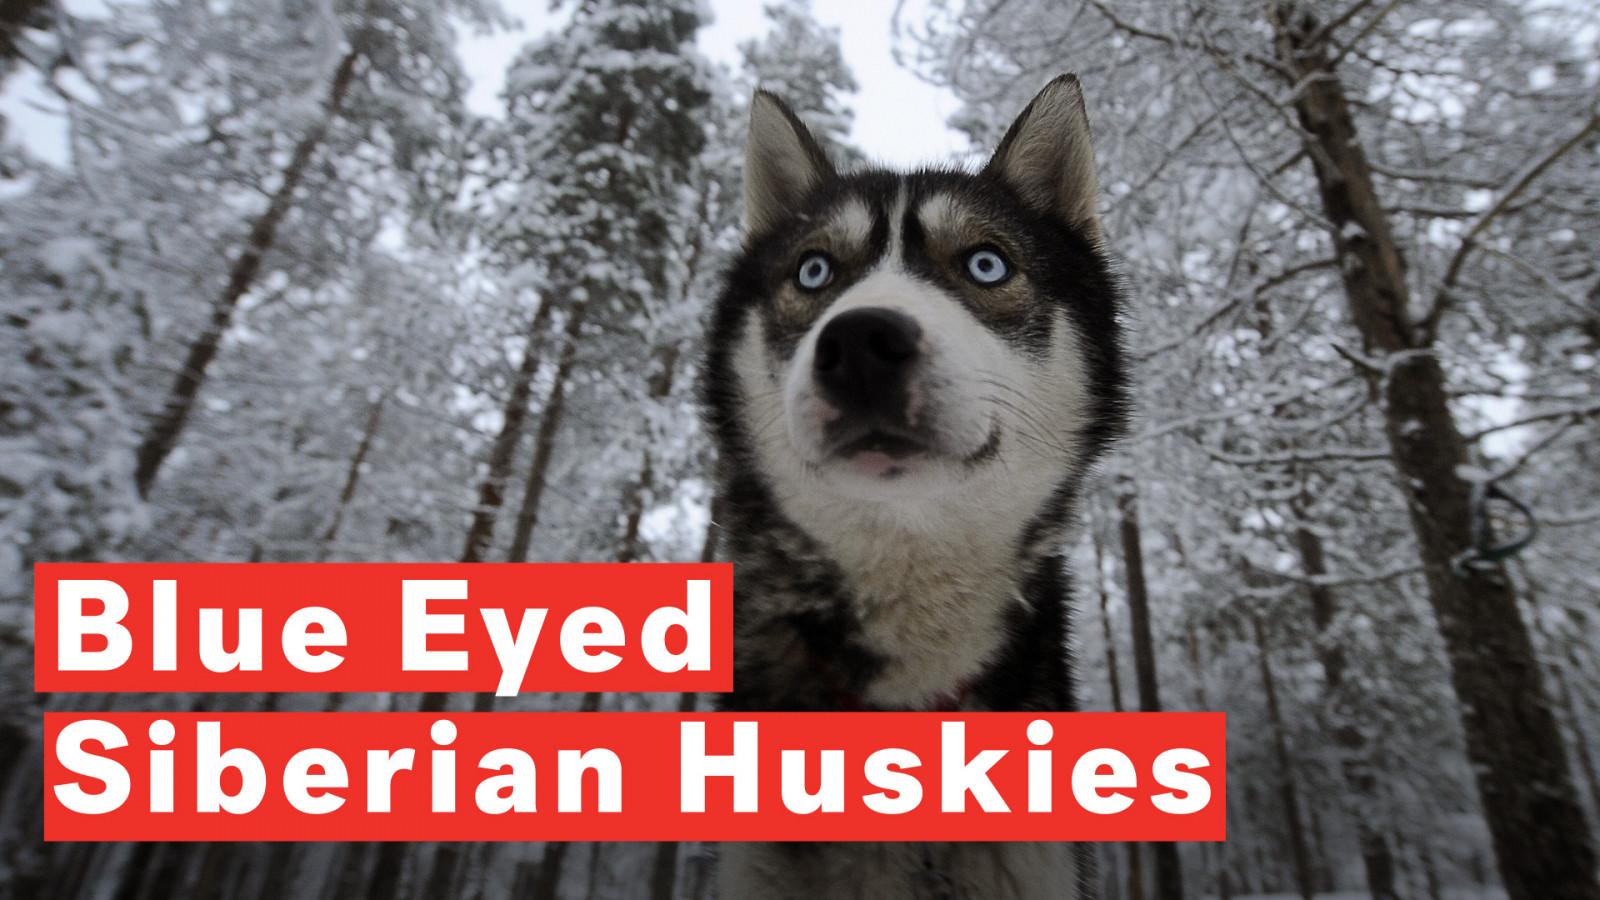 Husky Geschenk H/ört aufs Wort lustiges Husky Sweatshirt Husky